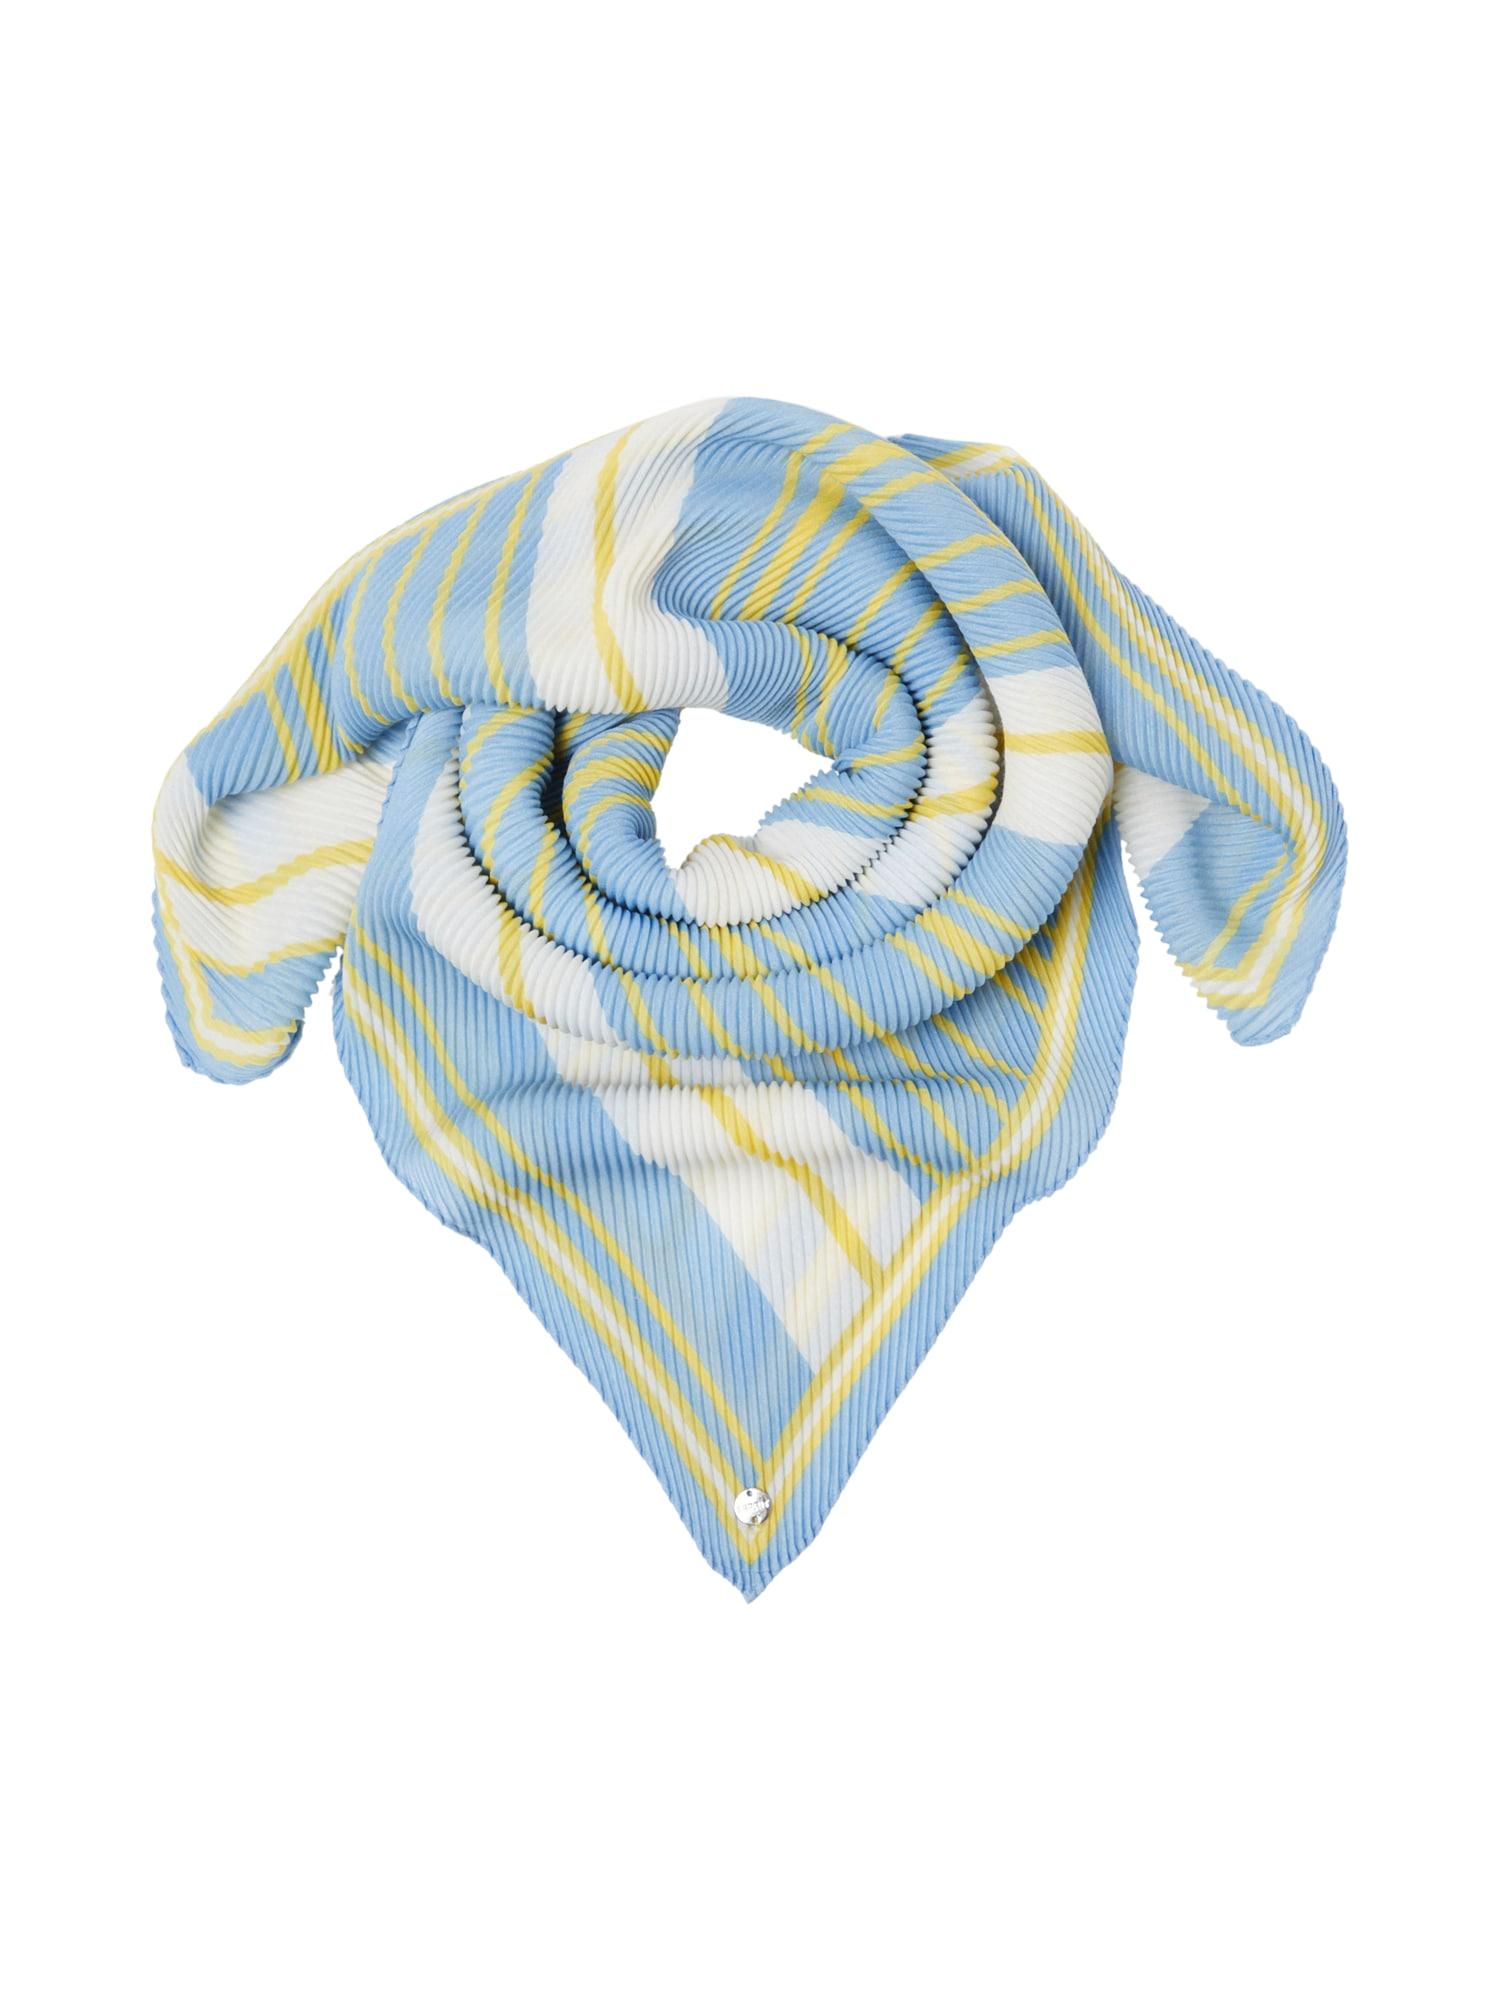 ESPRIT Skara 'Plisseesqua' balta / šviesiai mėlyna / geltona